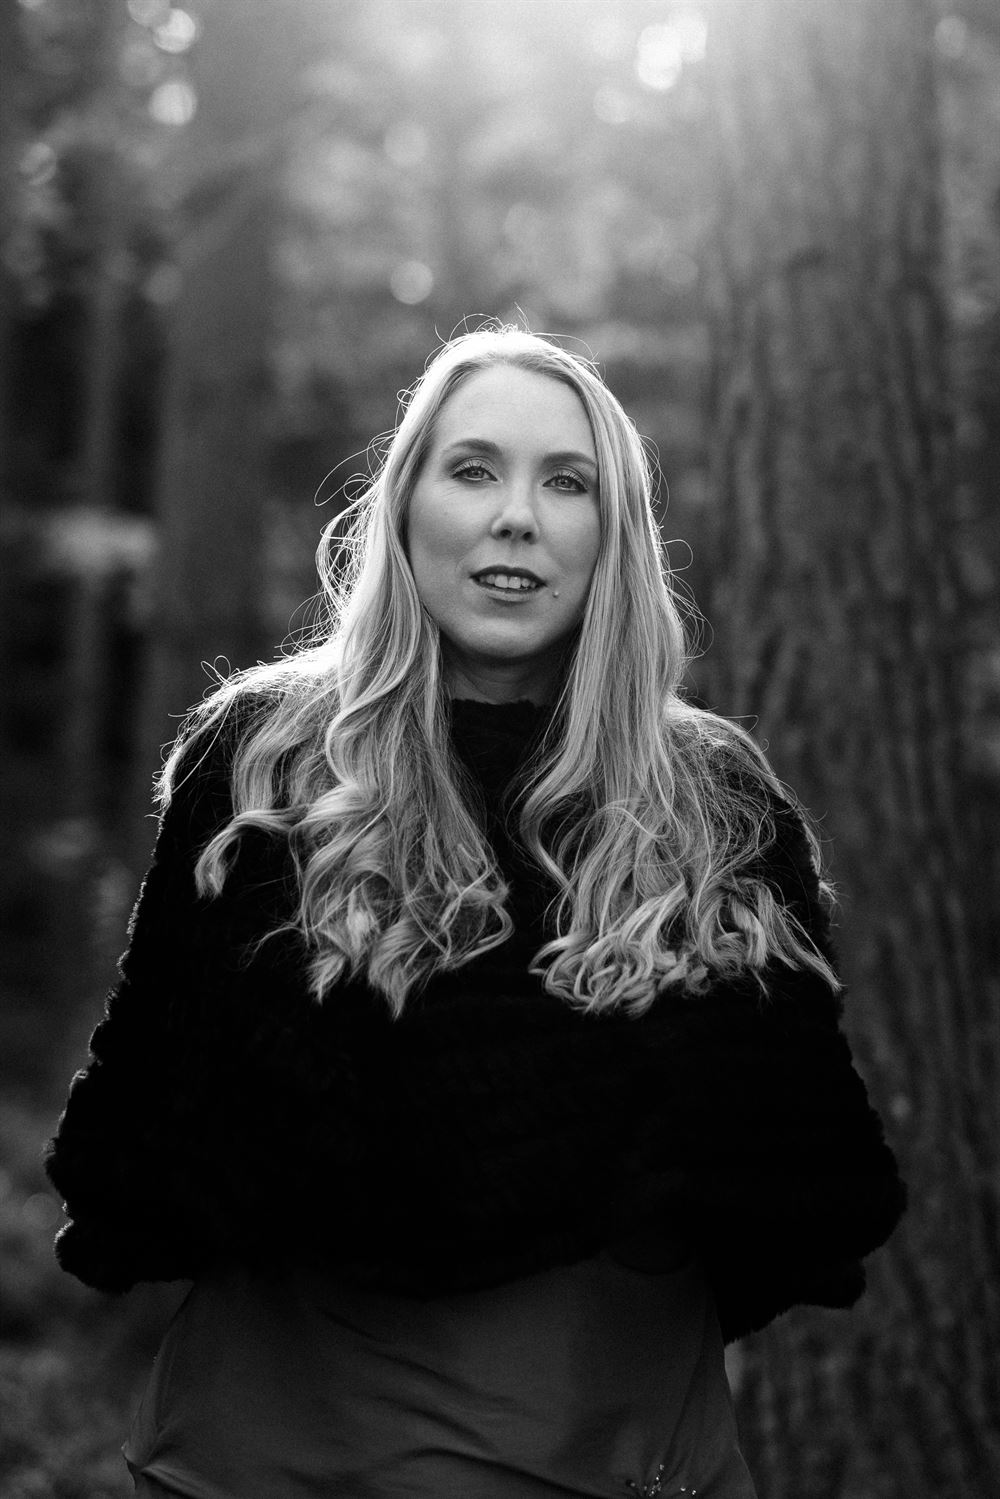 Susanna Stern 4b web - photo credit Niklas E Johansson